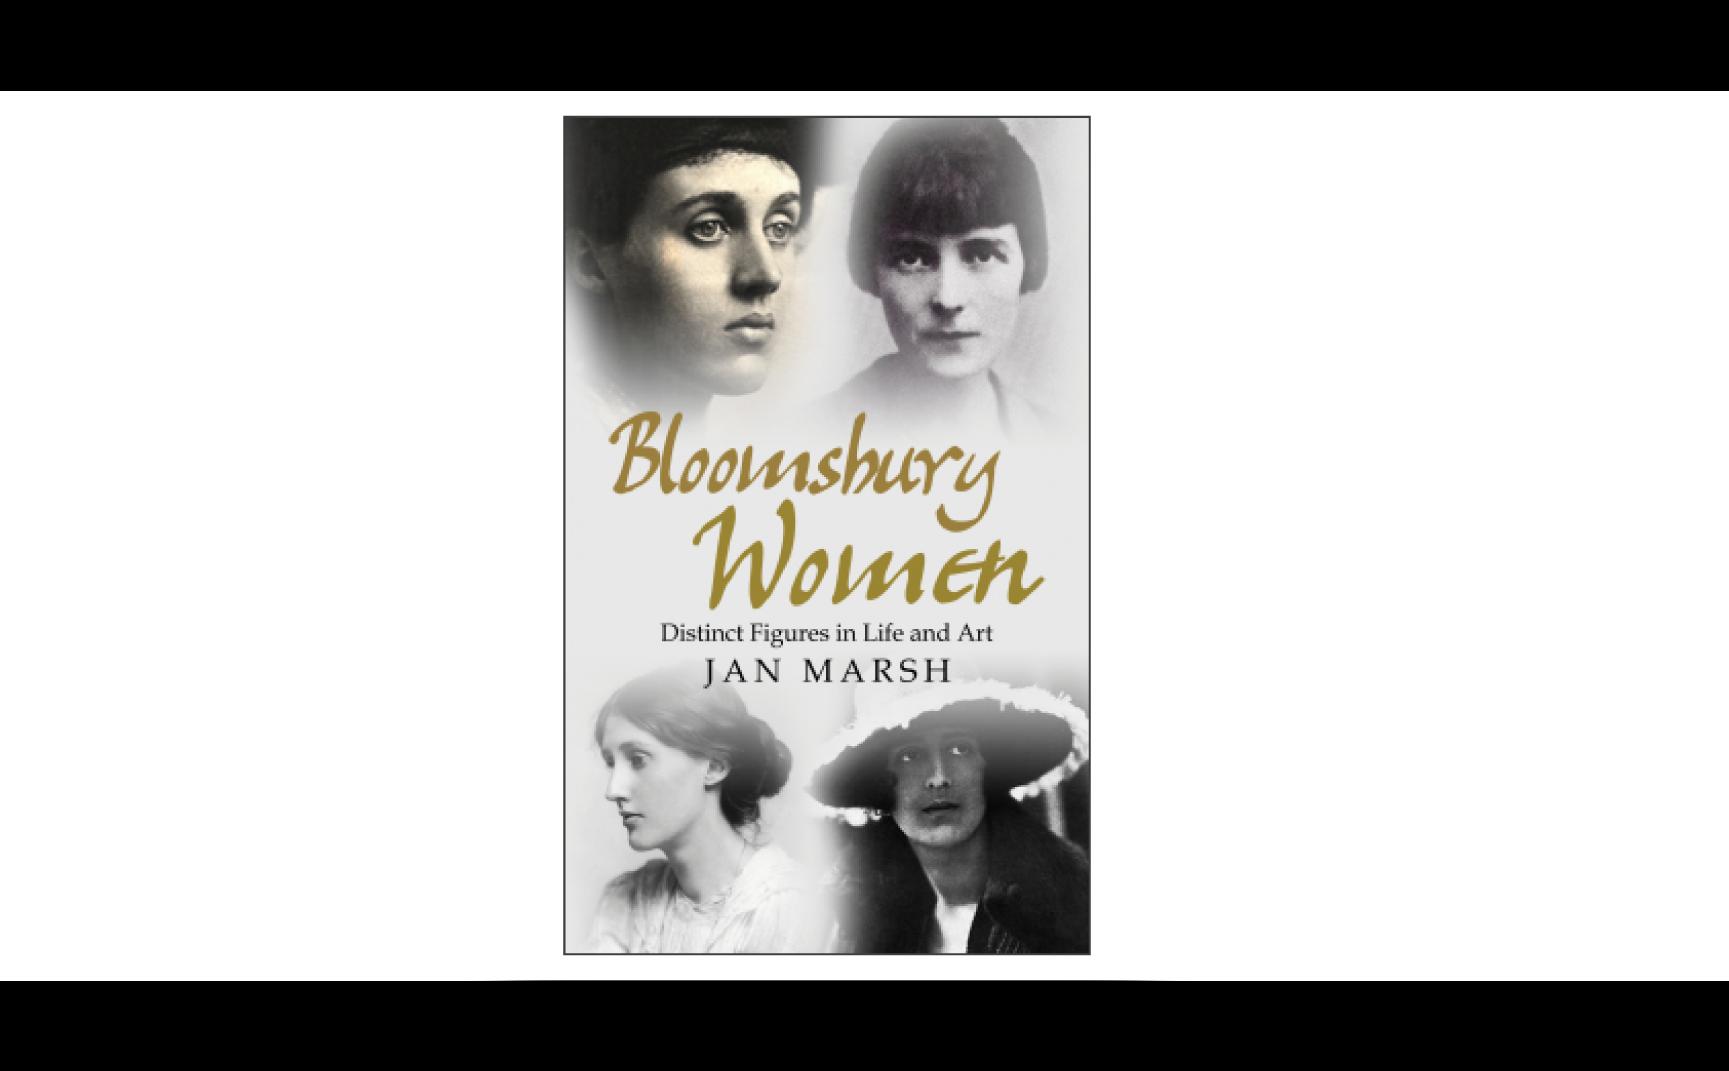 Bloomsbury women Jan Marsh review